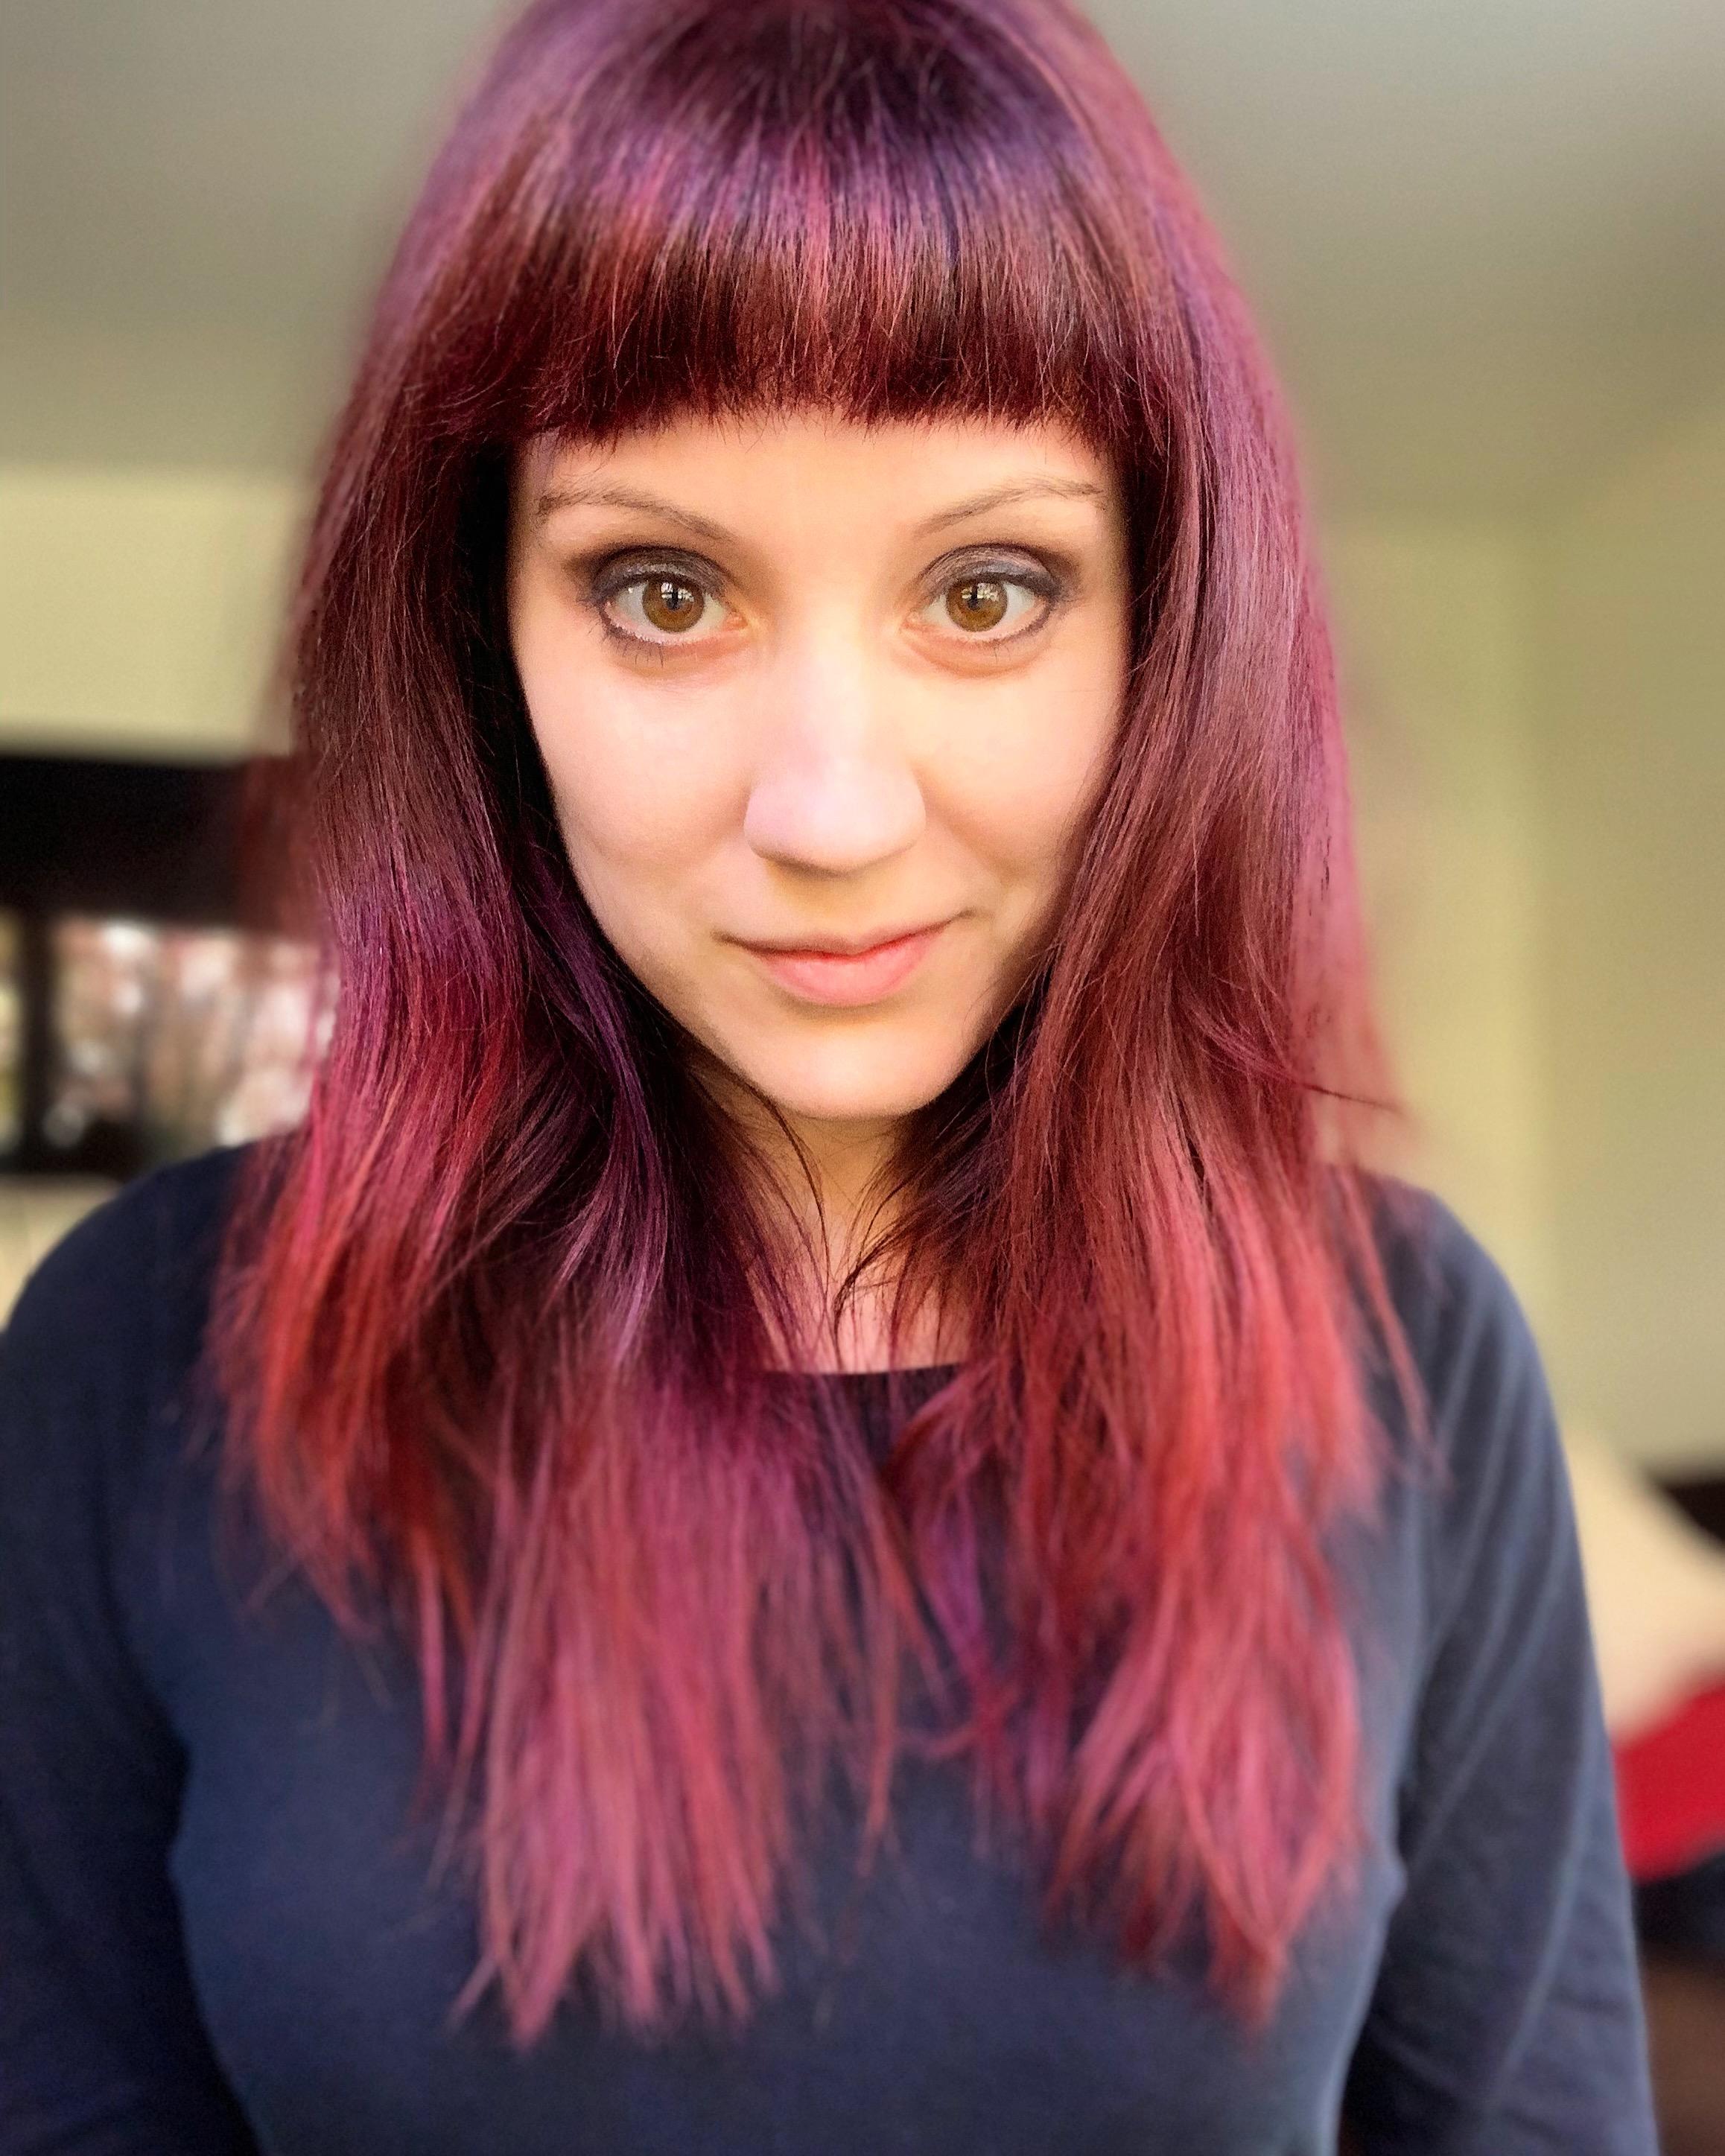 Megan Judkins